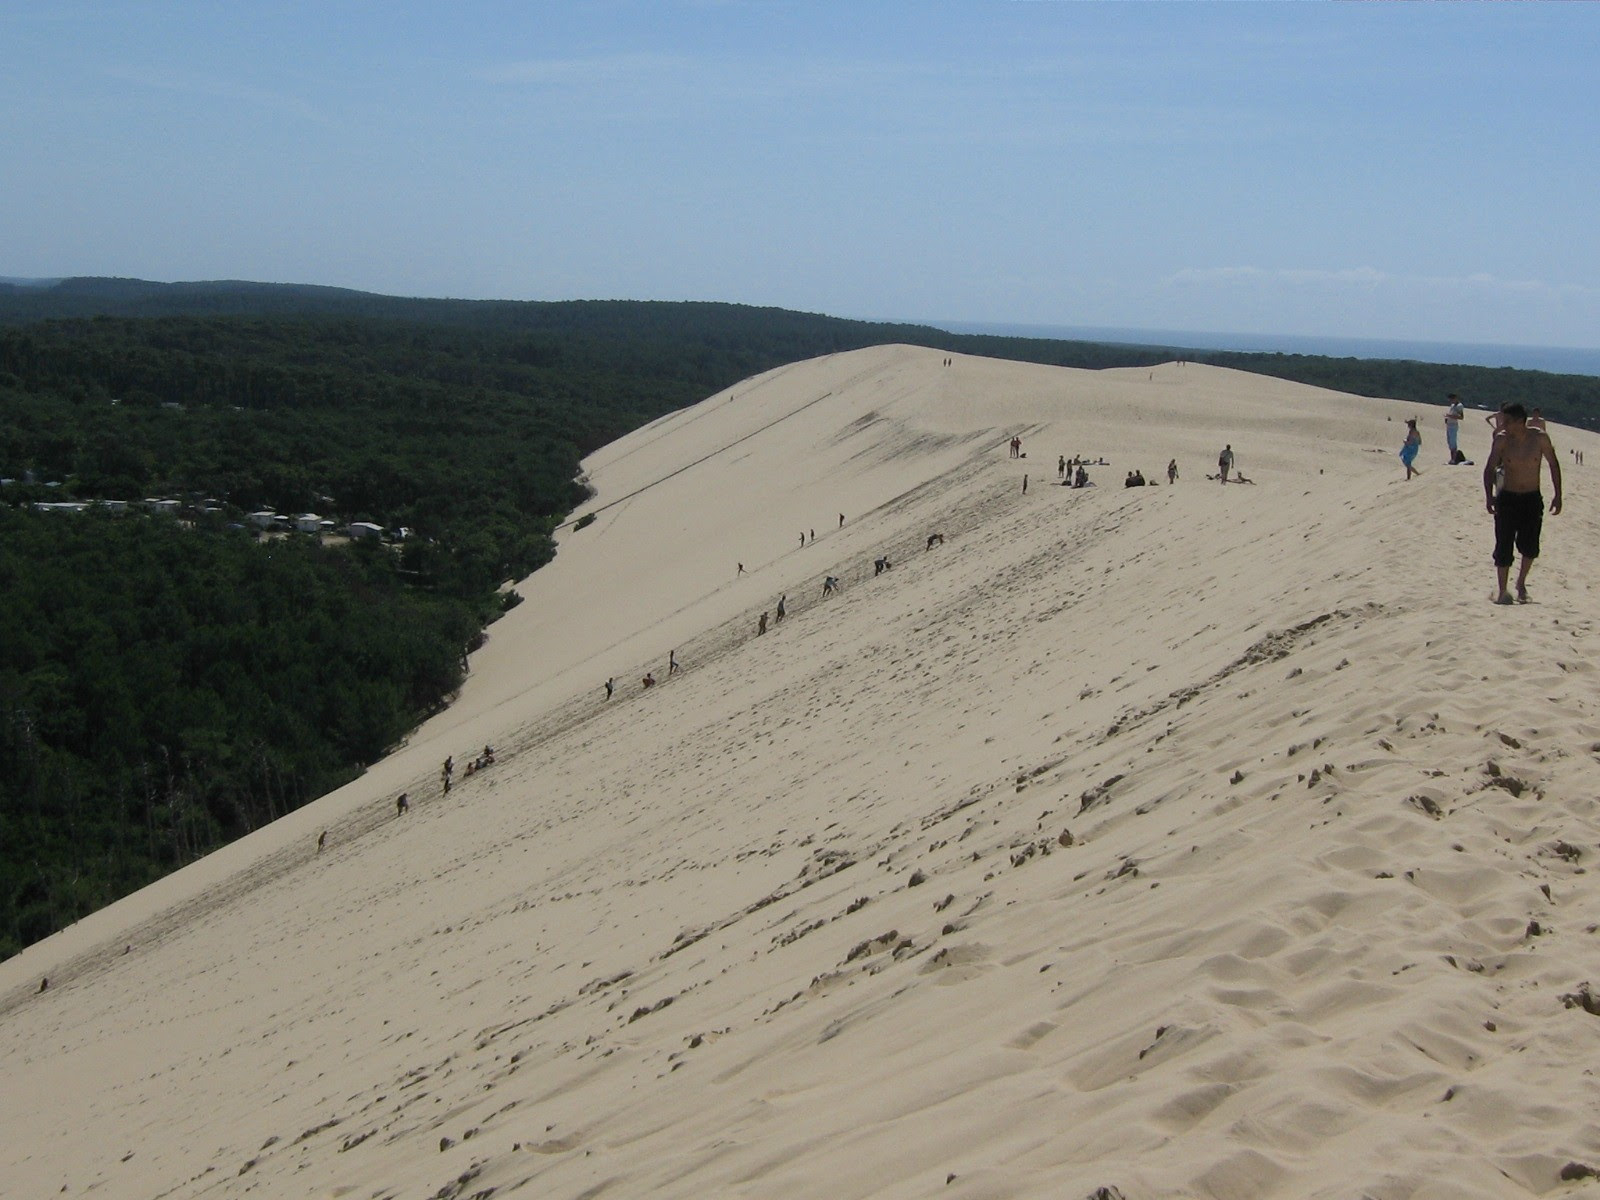 wj7DT Dune de Pyla   A new Sahara desert being born   in France! [30 pics]